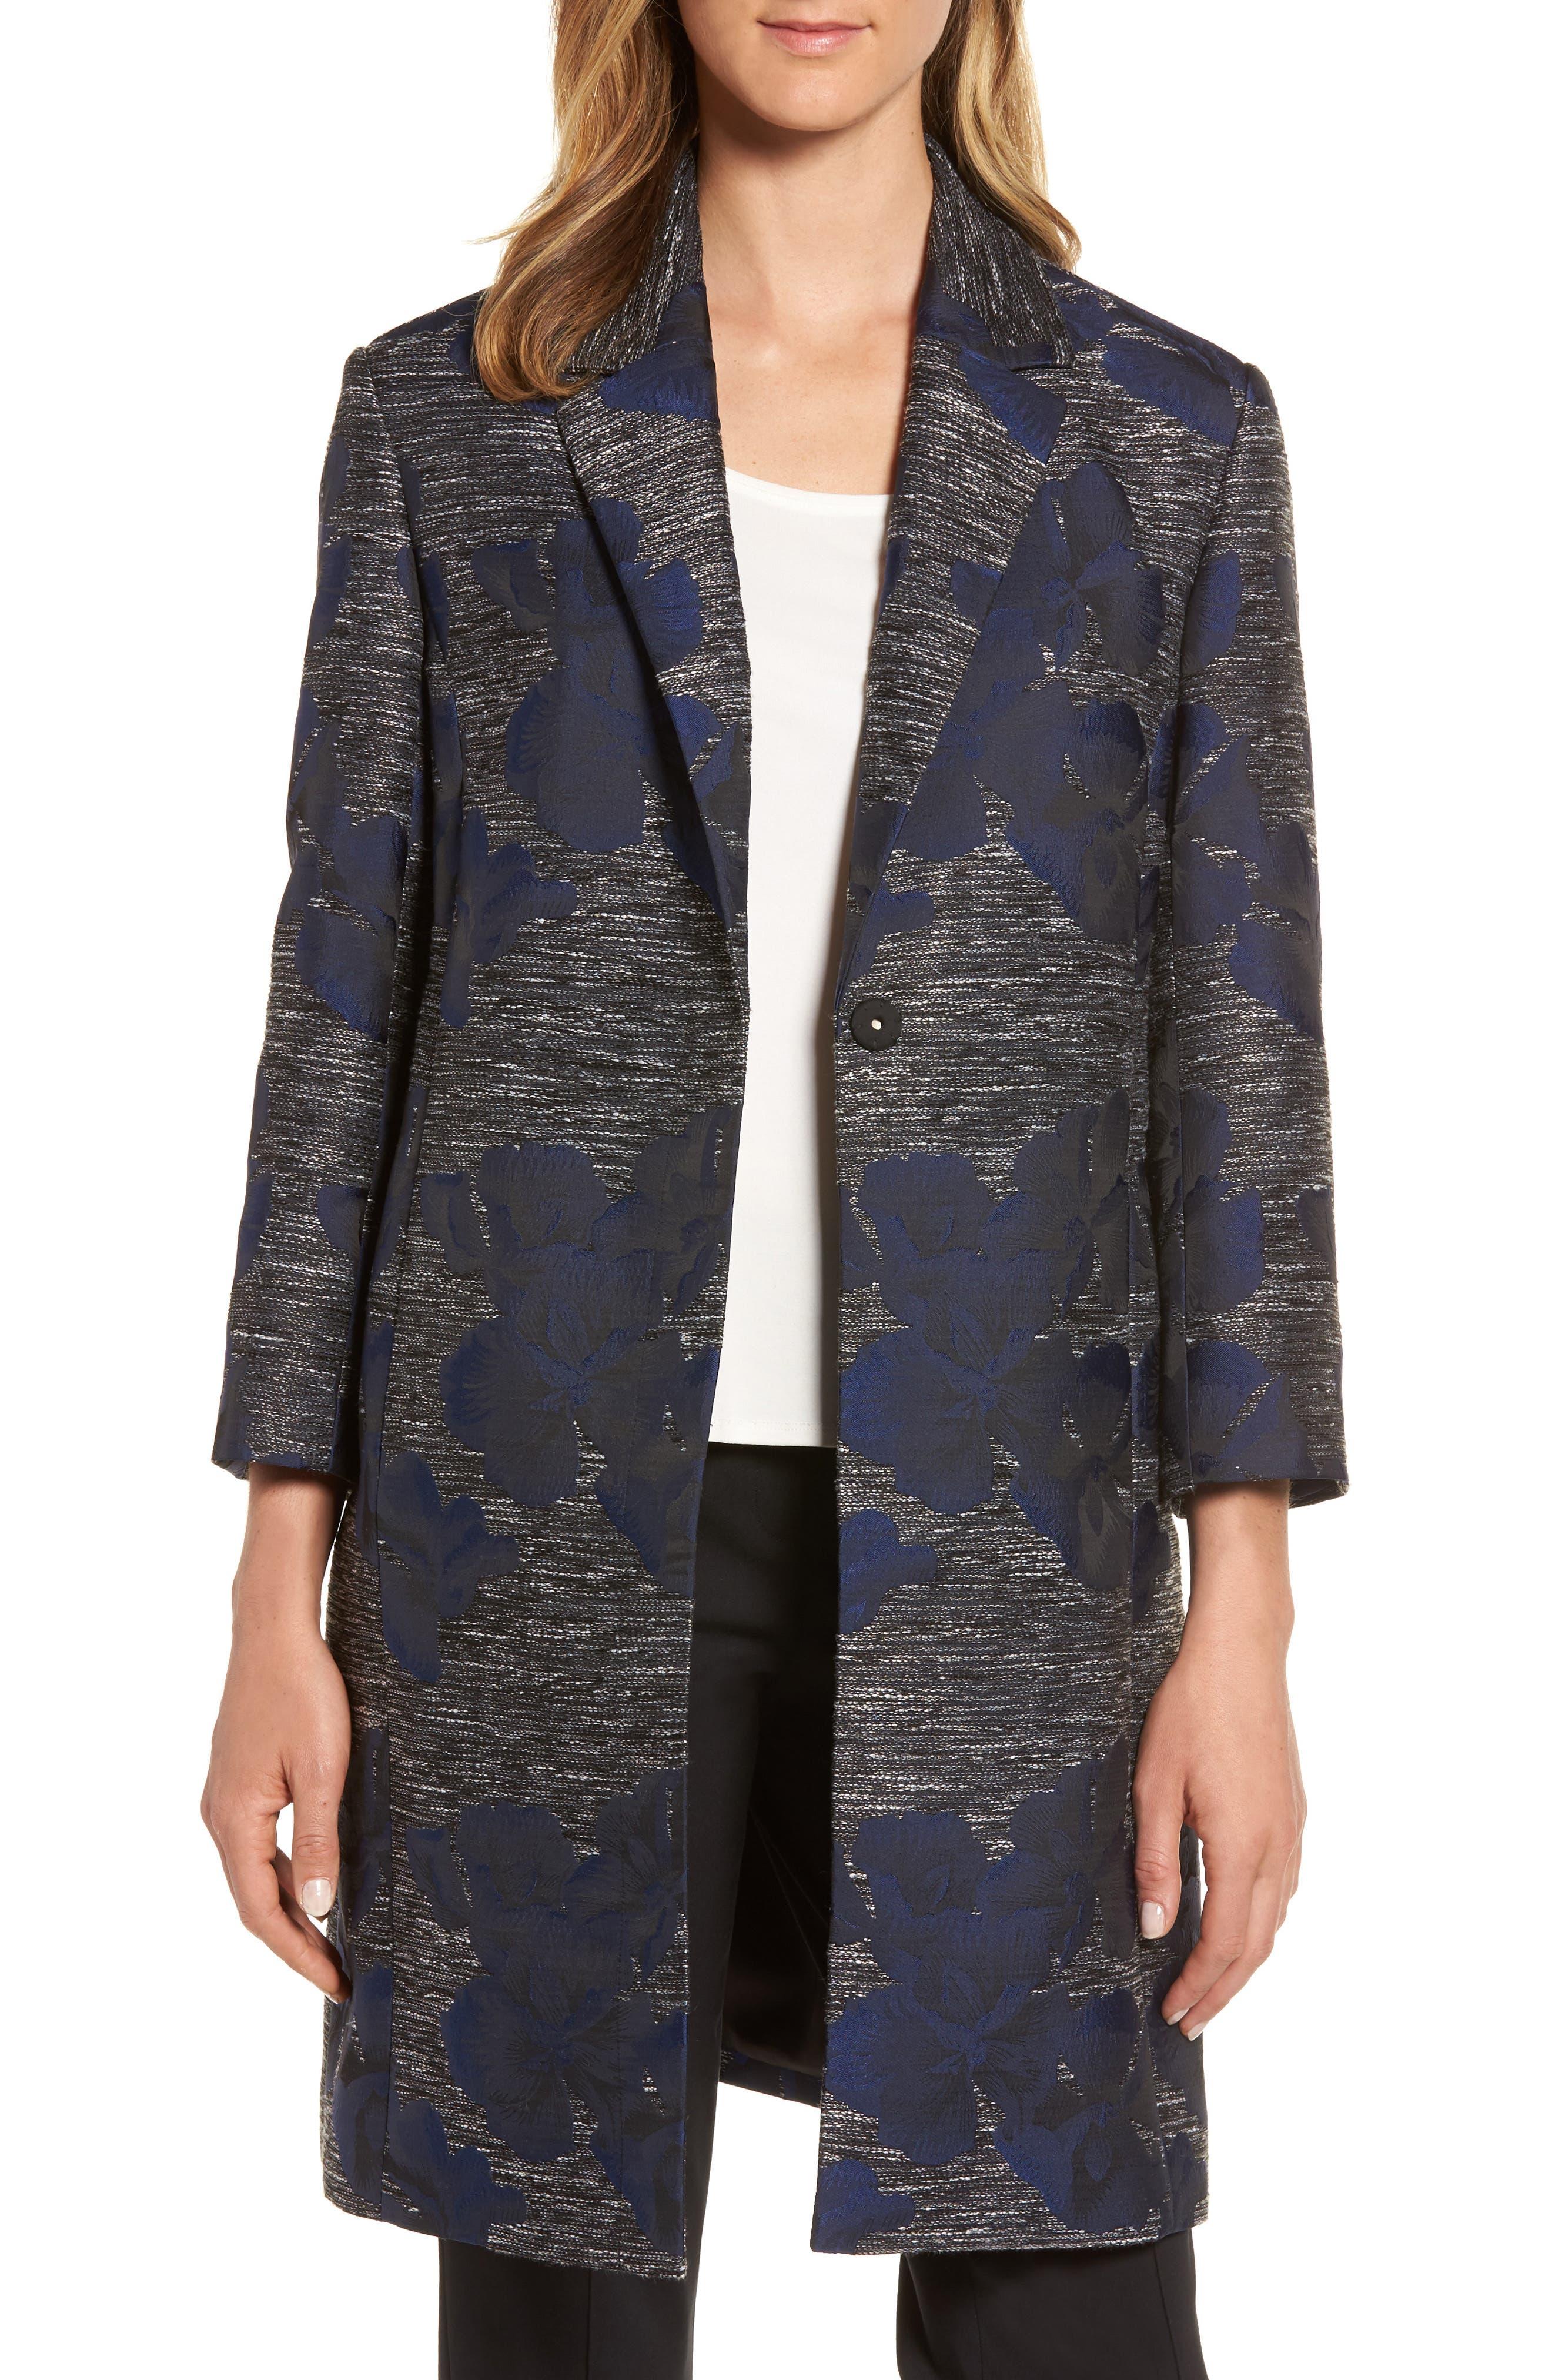 Emerson Rose Jacquard Jacket